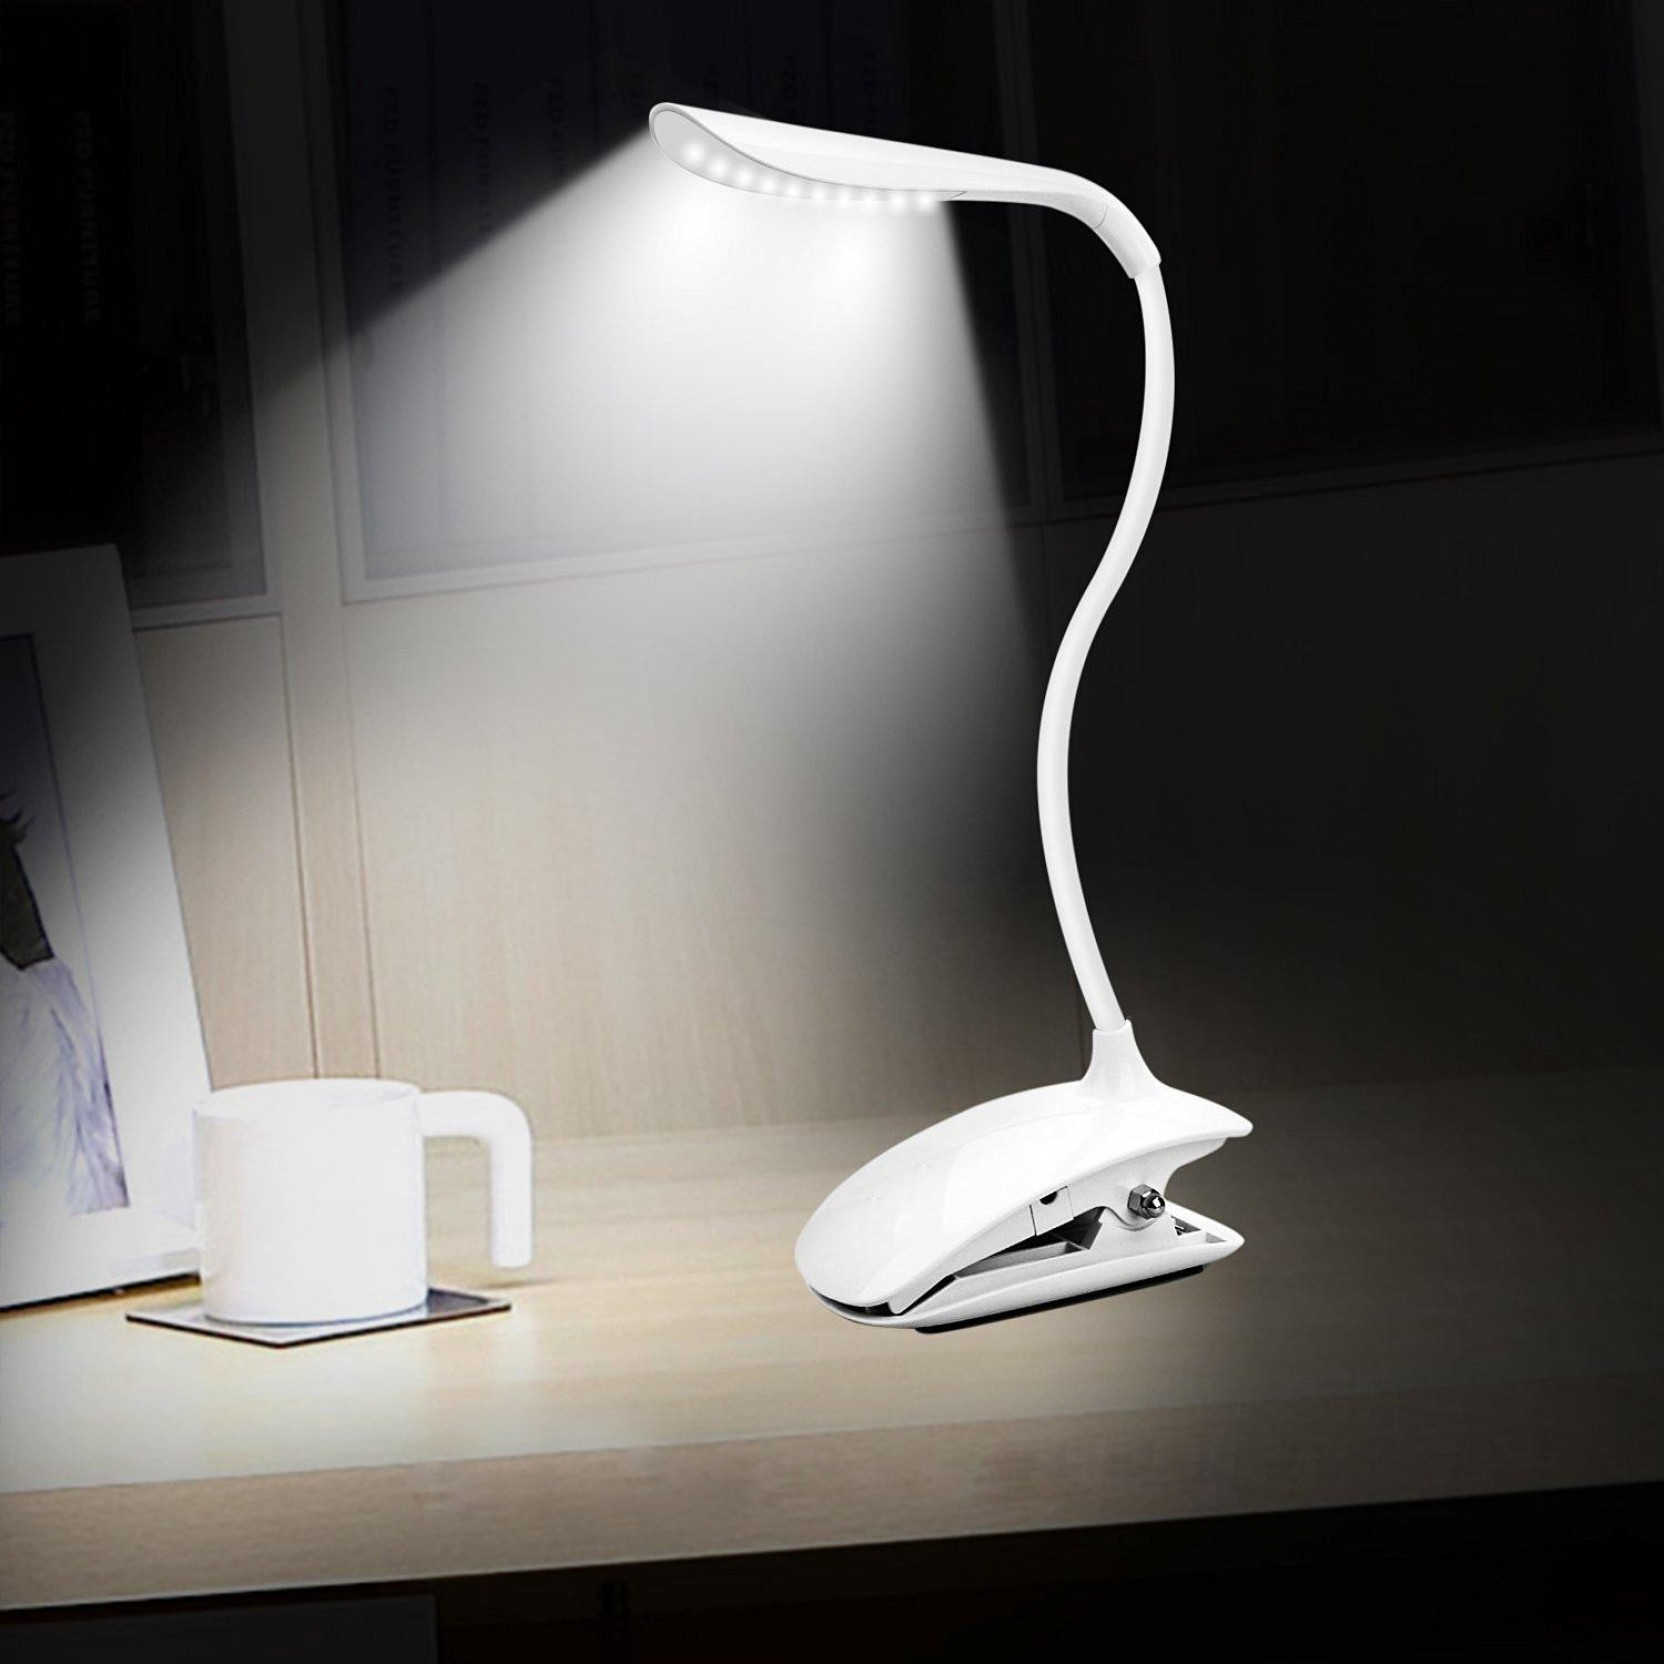 Bonzeal led clip table lamp price in india buy bonzeal for Table lamp flipkart